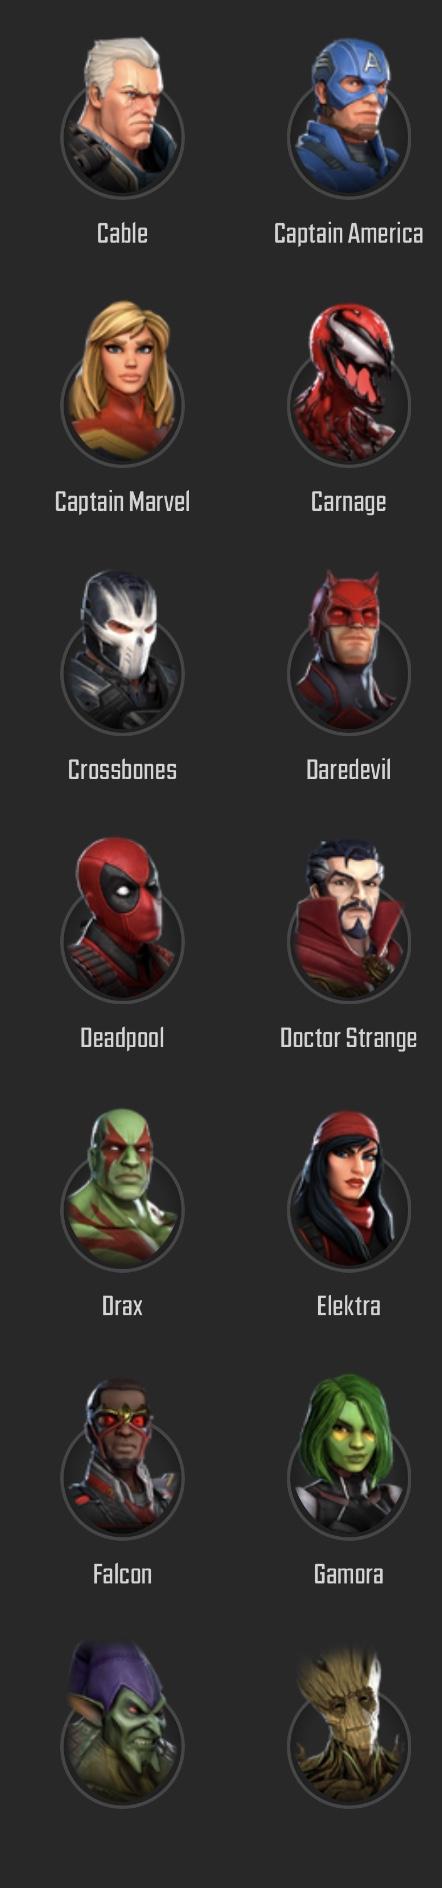 Marvel Strike Force: AKA Star Wars Galaxy of (Marvel) Heroes